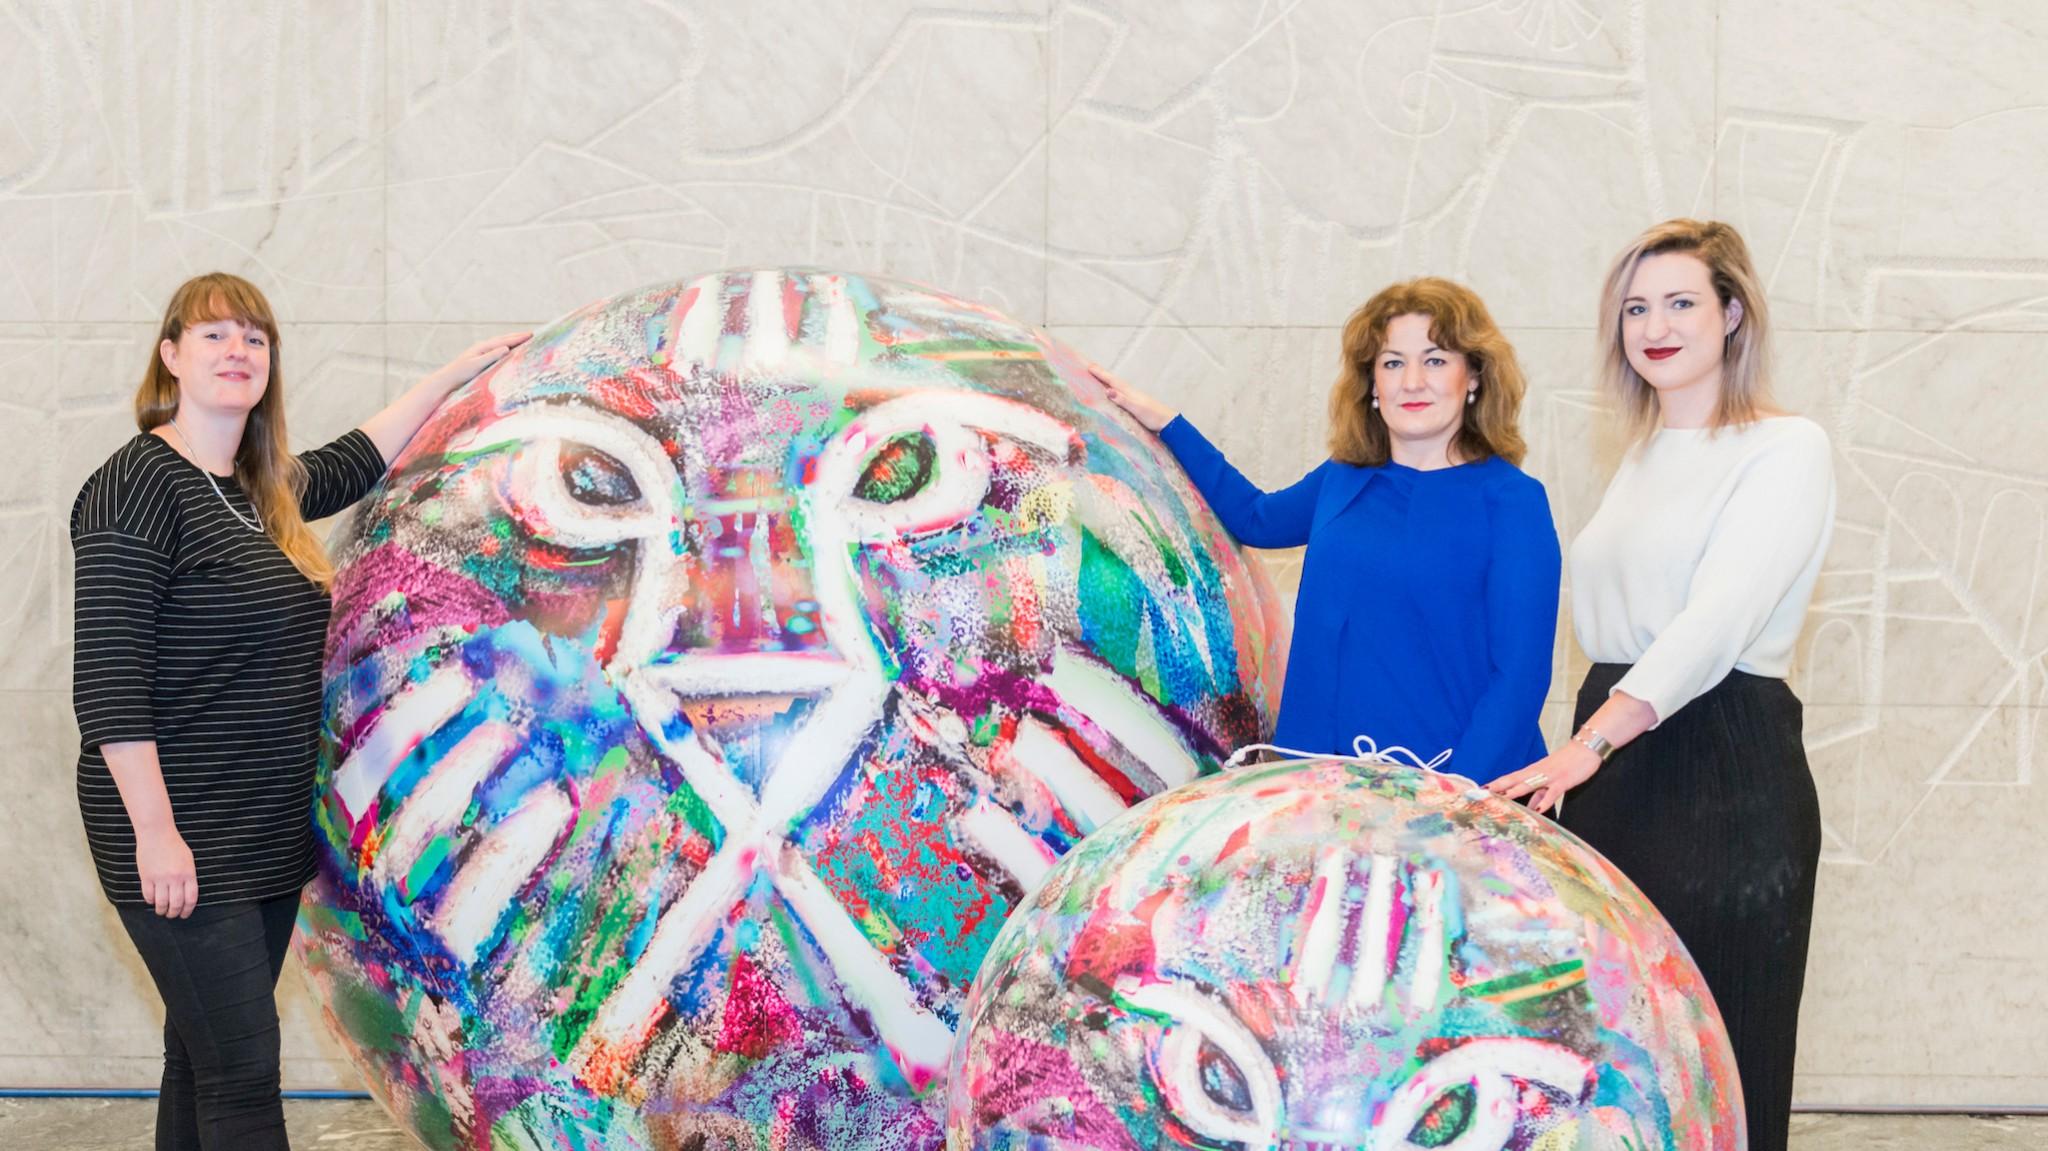 Opblaasbare ballen bollen ballonen inflatable spheres balls - IFFR - Publi air